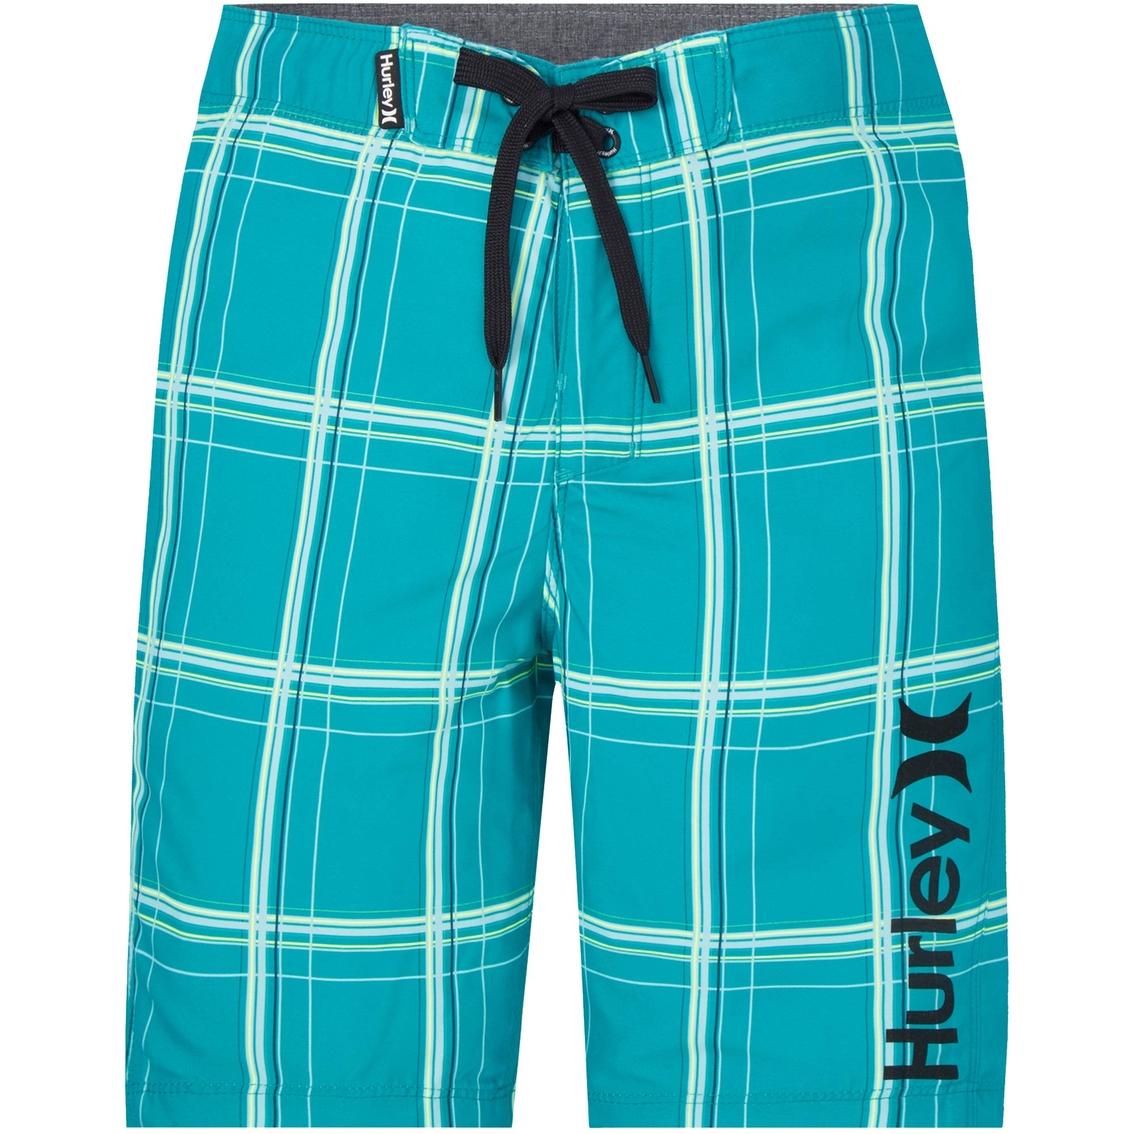 WYZVK22 American Grown Vietnam Roots Soft//Cozy Sweatpants Boys Trousers Boy for Teen Girls